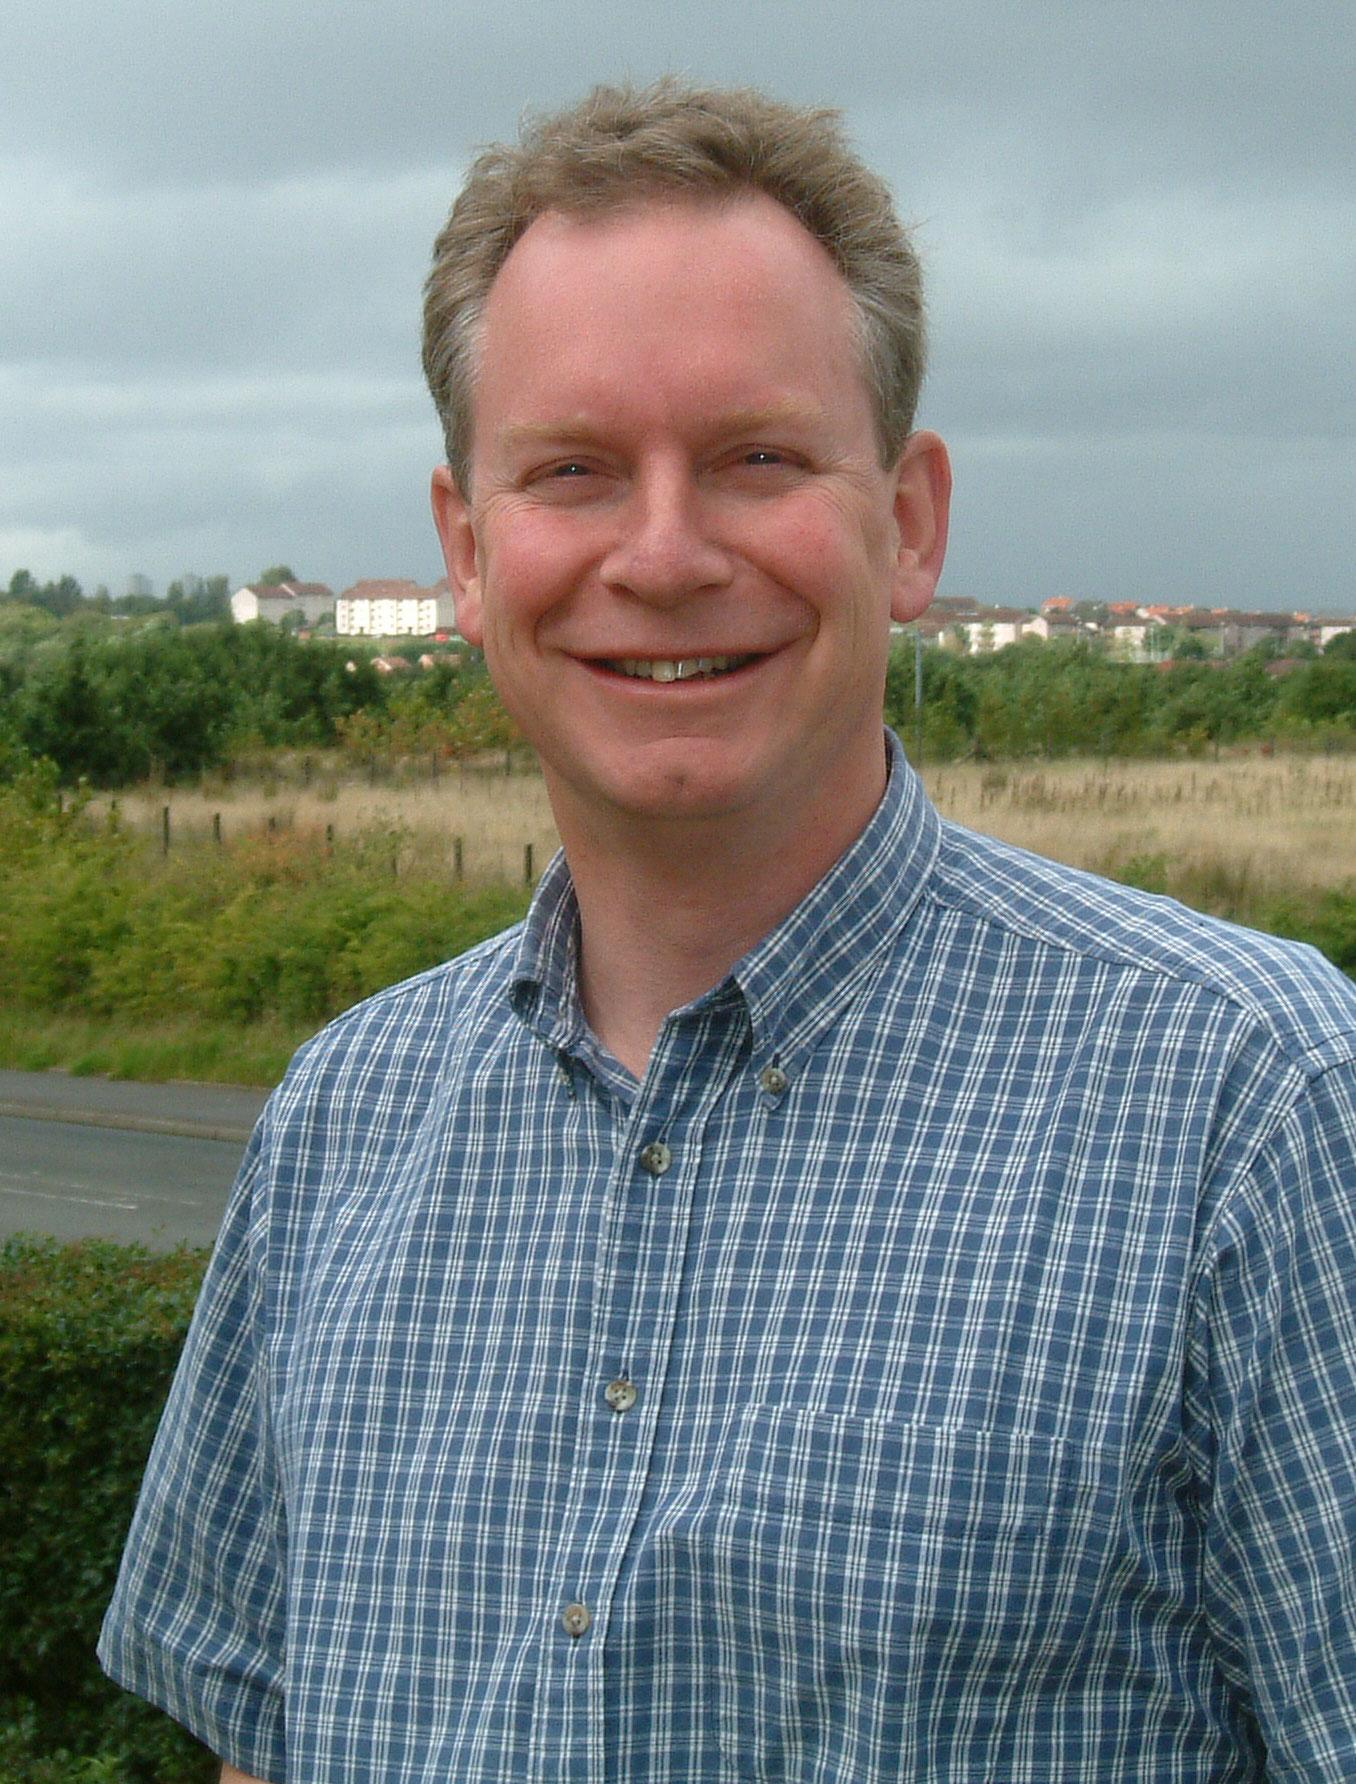 Nicholas Morris – Voluntary Action Perthshire : Holyrood PR